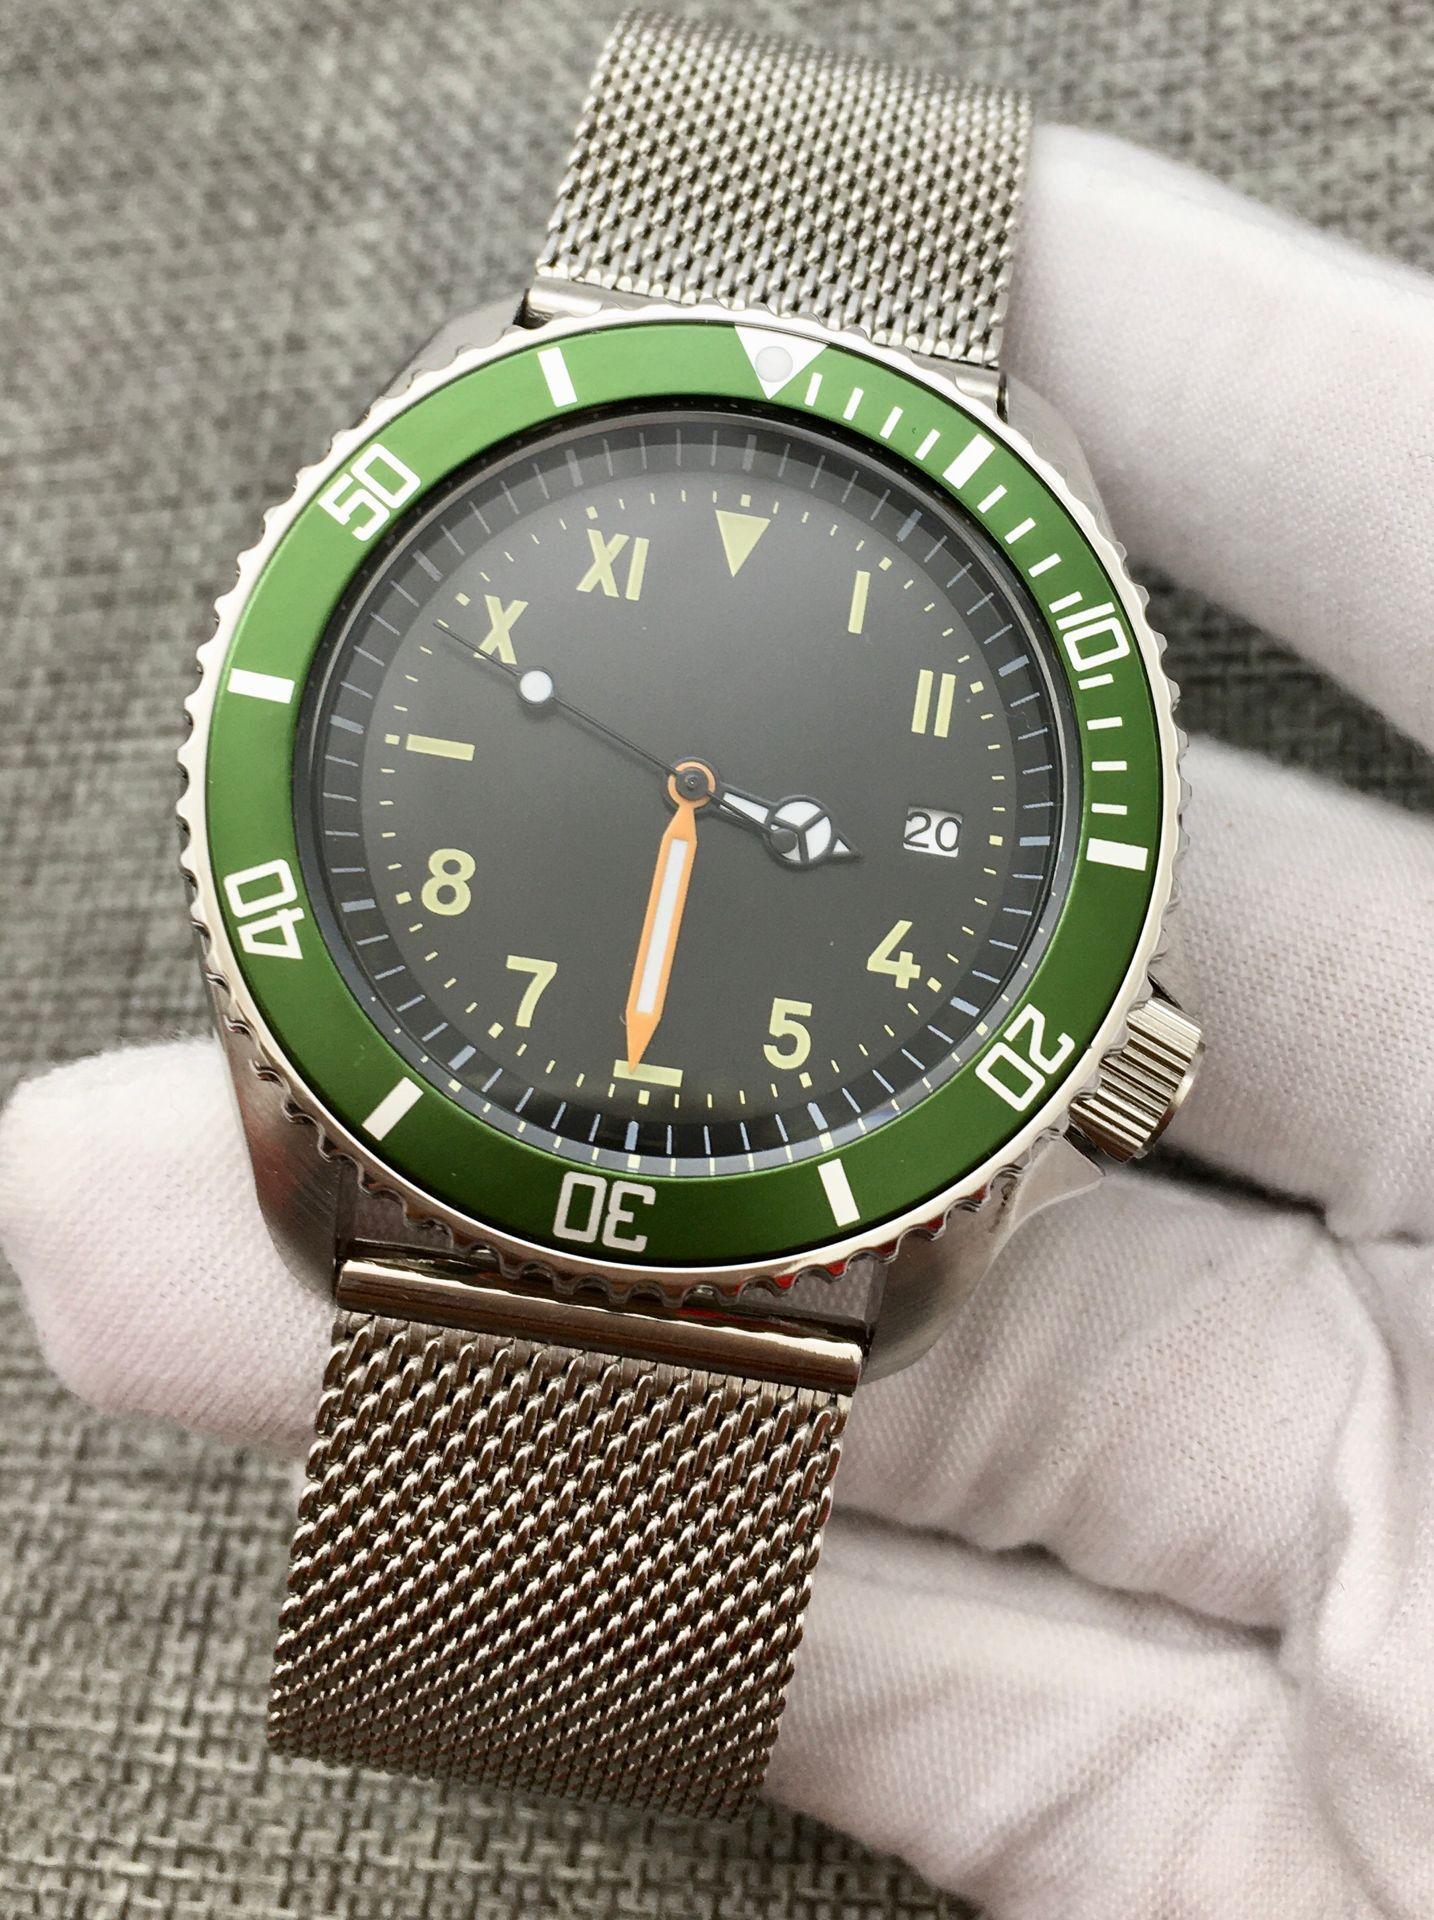 Retro 42MM Black Dial Date Luminous sk007 Mechanical Men's NH35 Automatic Watch Rotating Bezel Mesh Strap